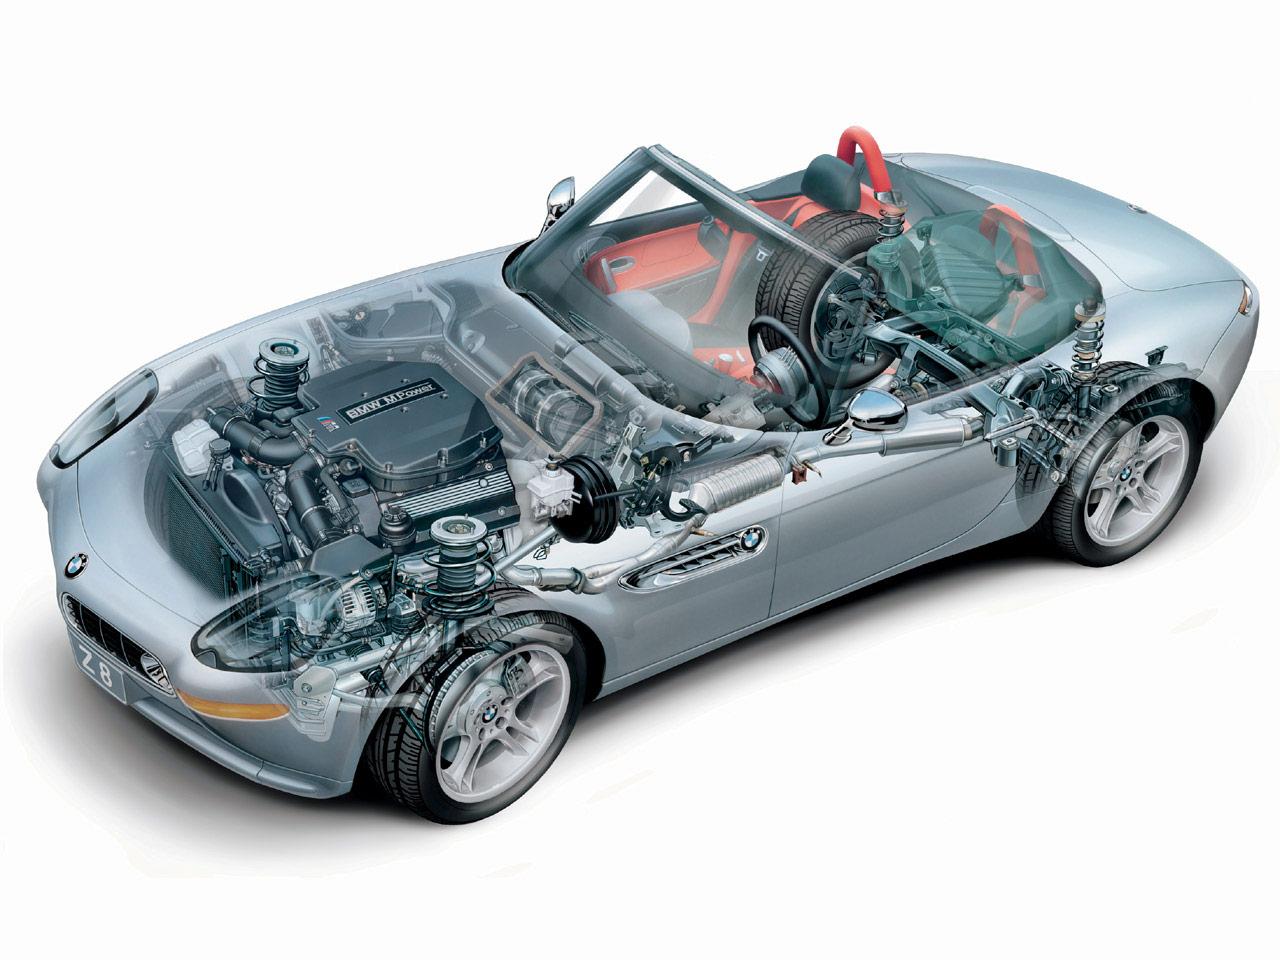 BMW Z8 cutaway